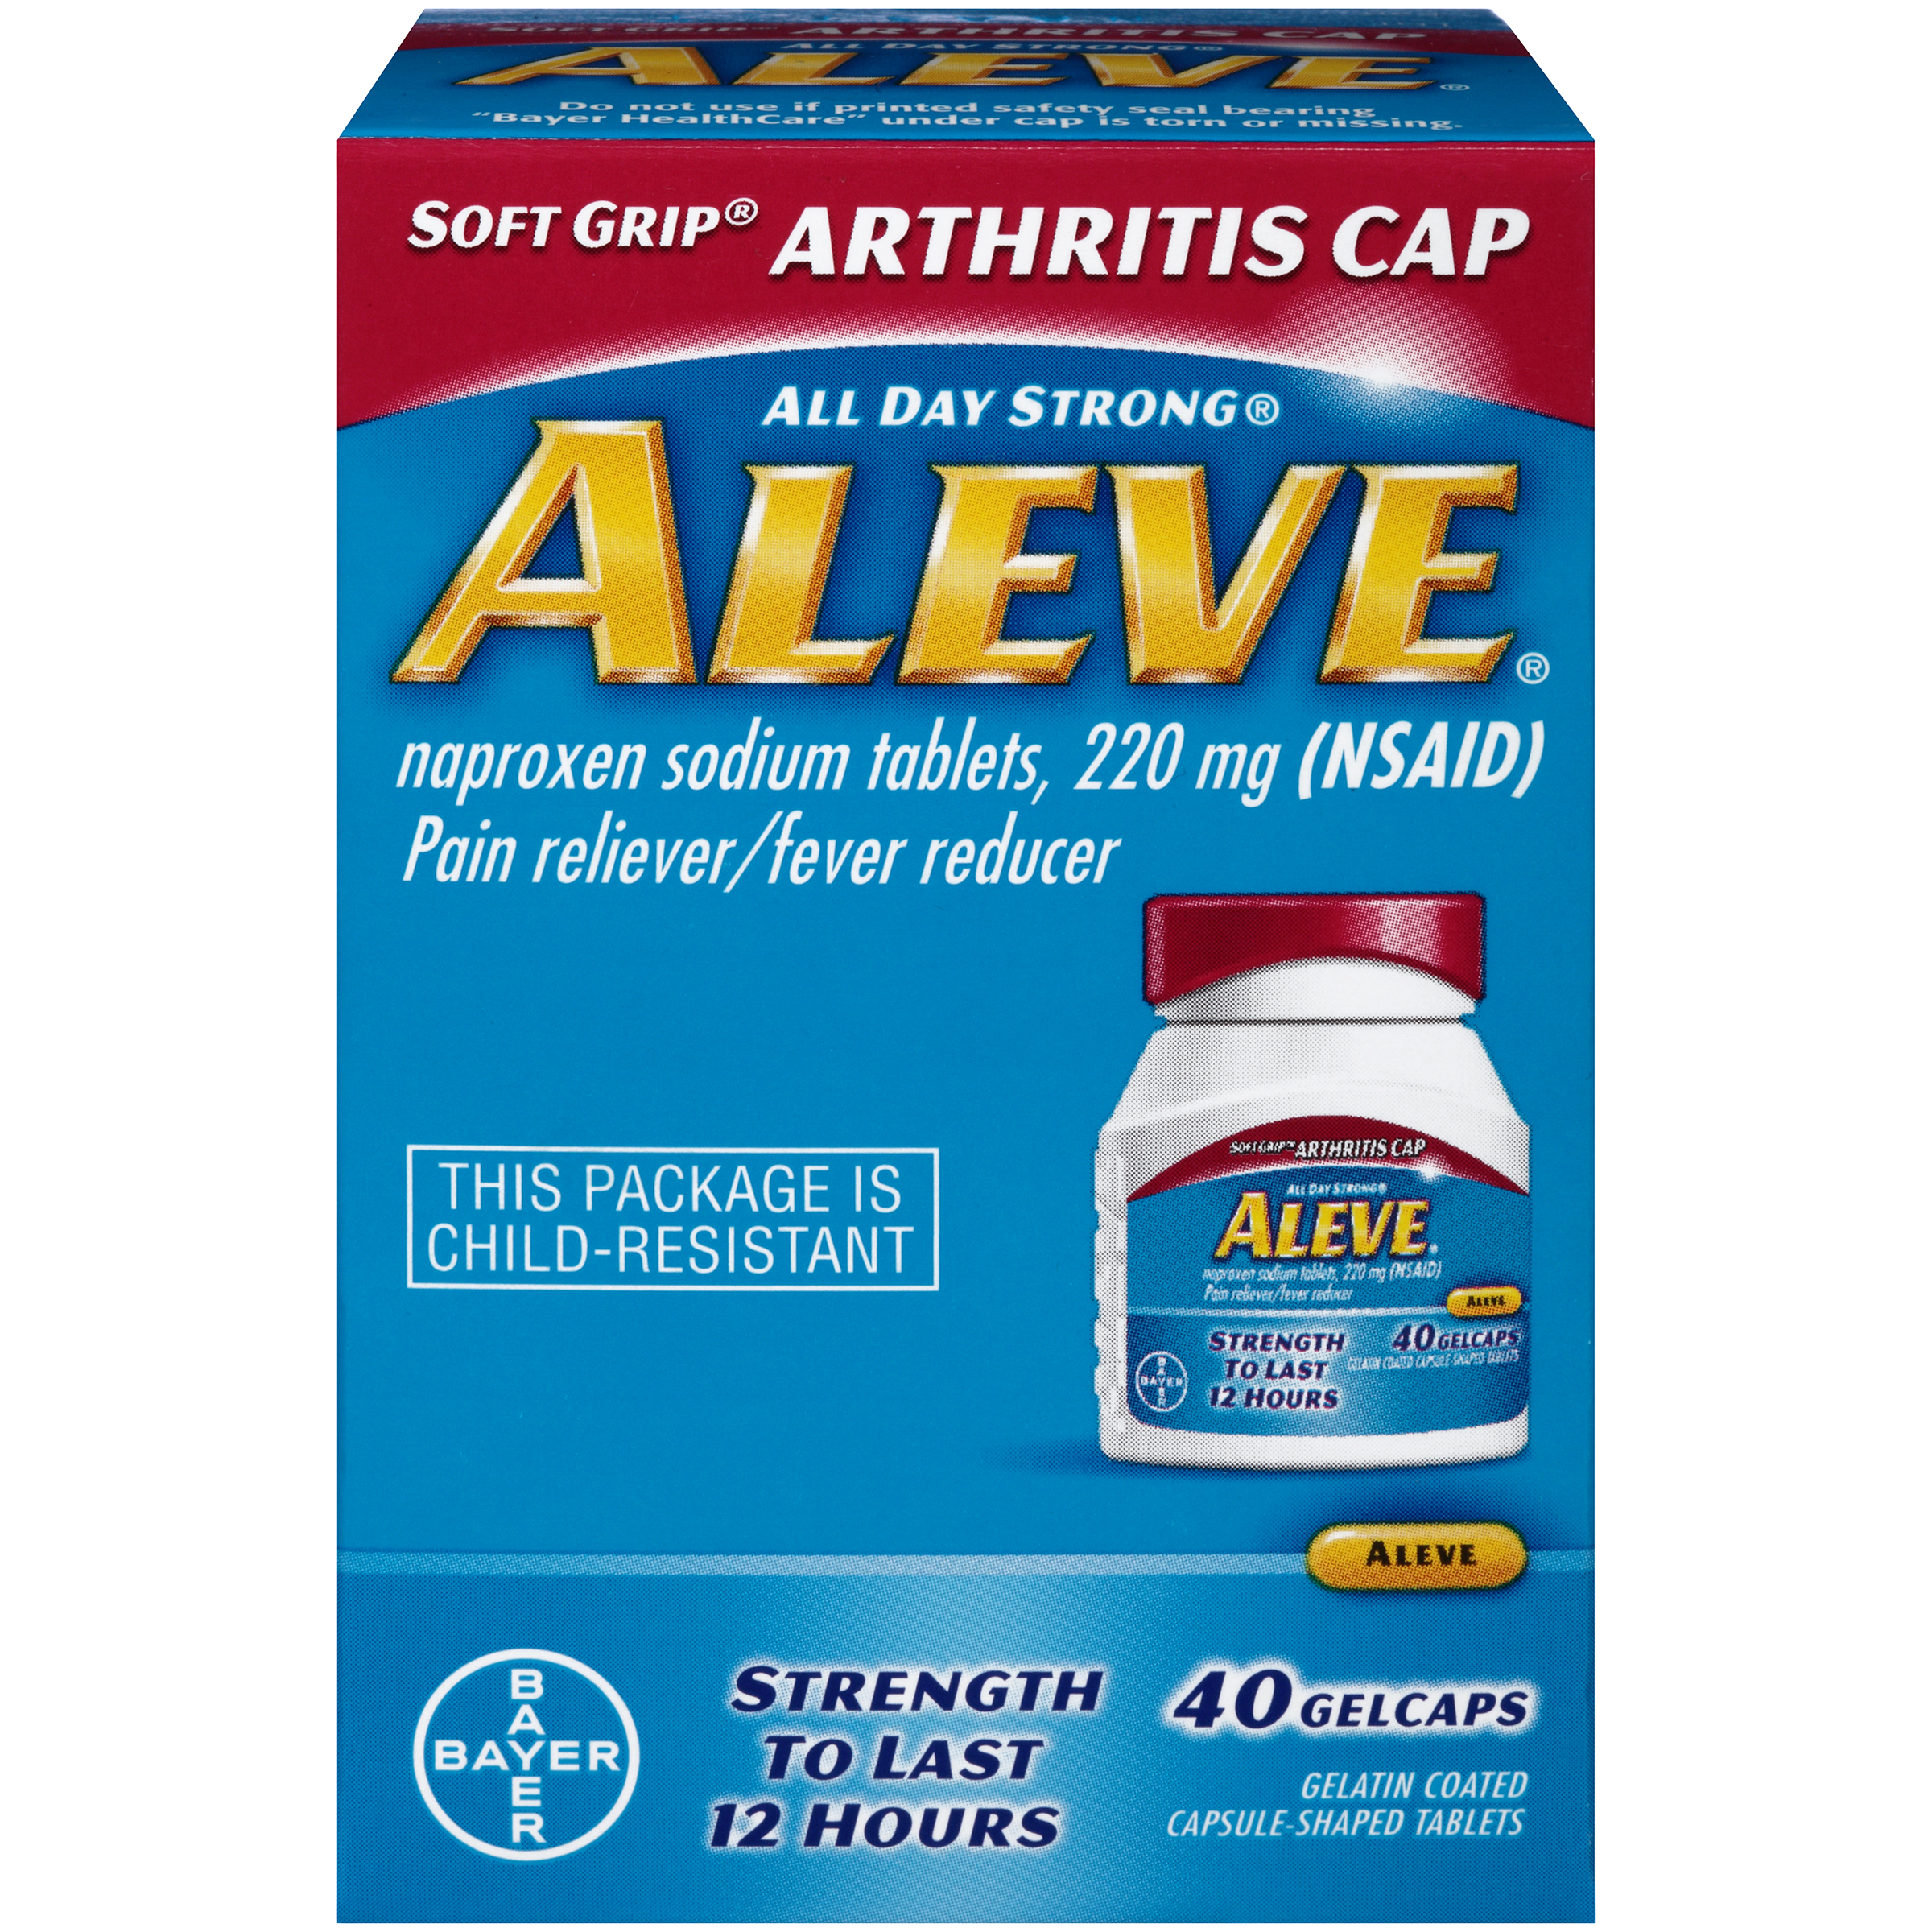 Aleve Soft Grip Arthritis Cap Pain Reliever/Fever Reducer Naproxen Sodium Gelcaps, 220 mg, 40 Ct